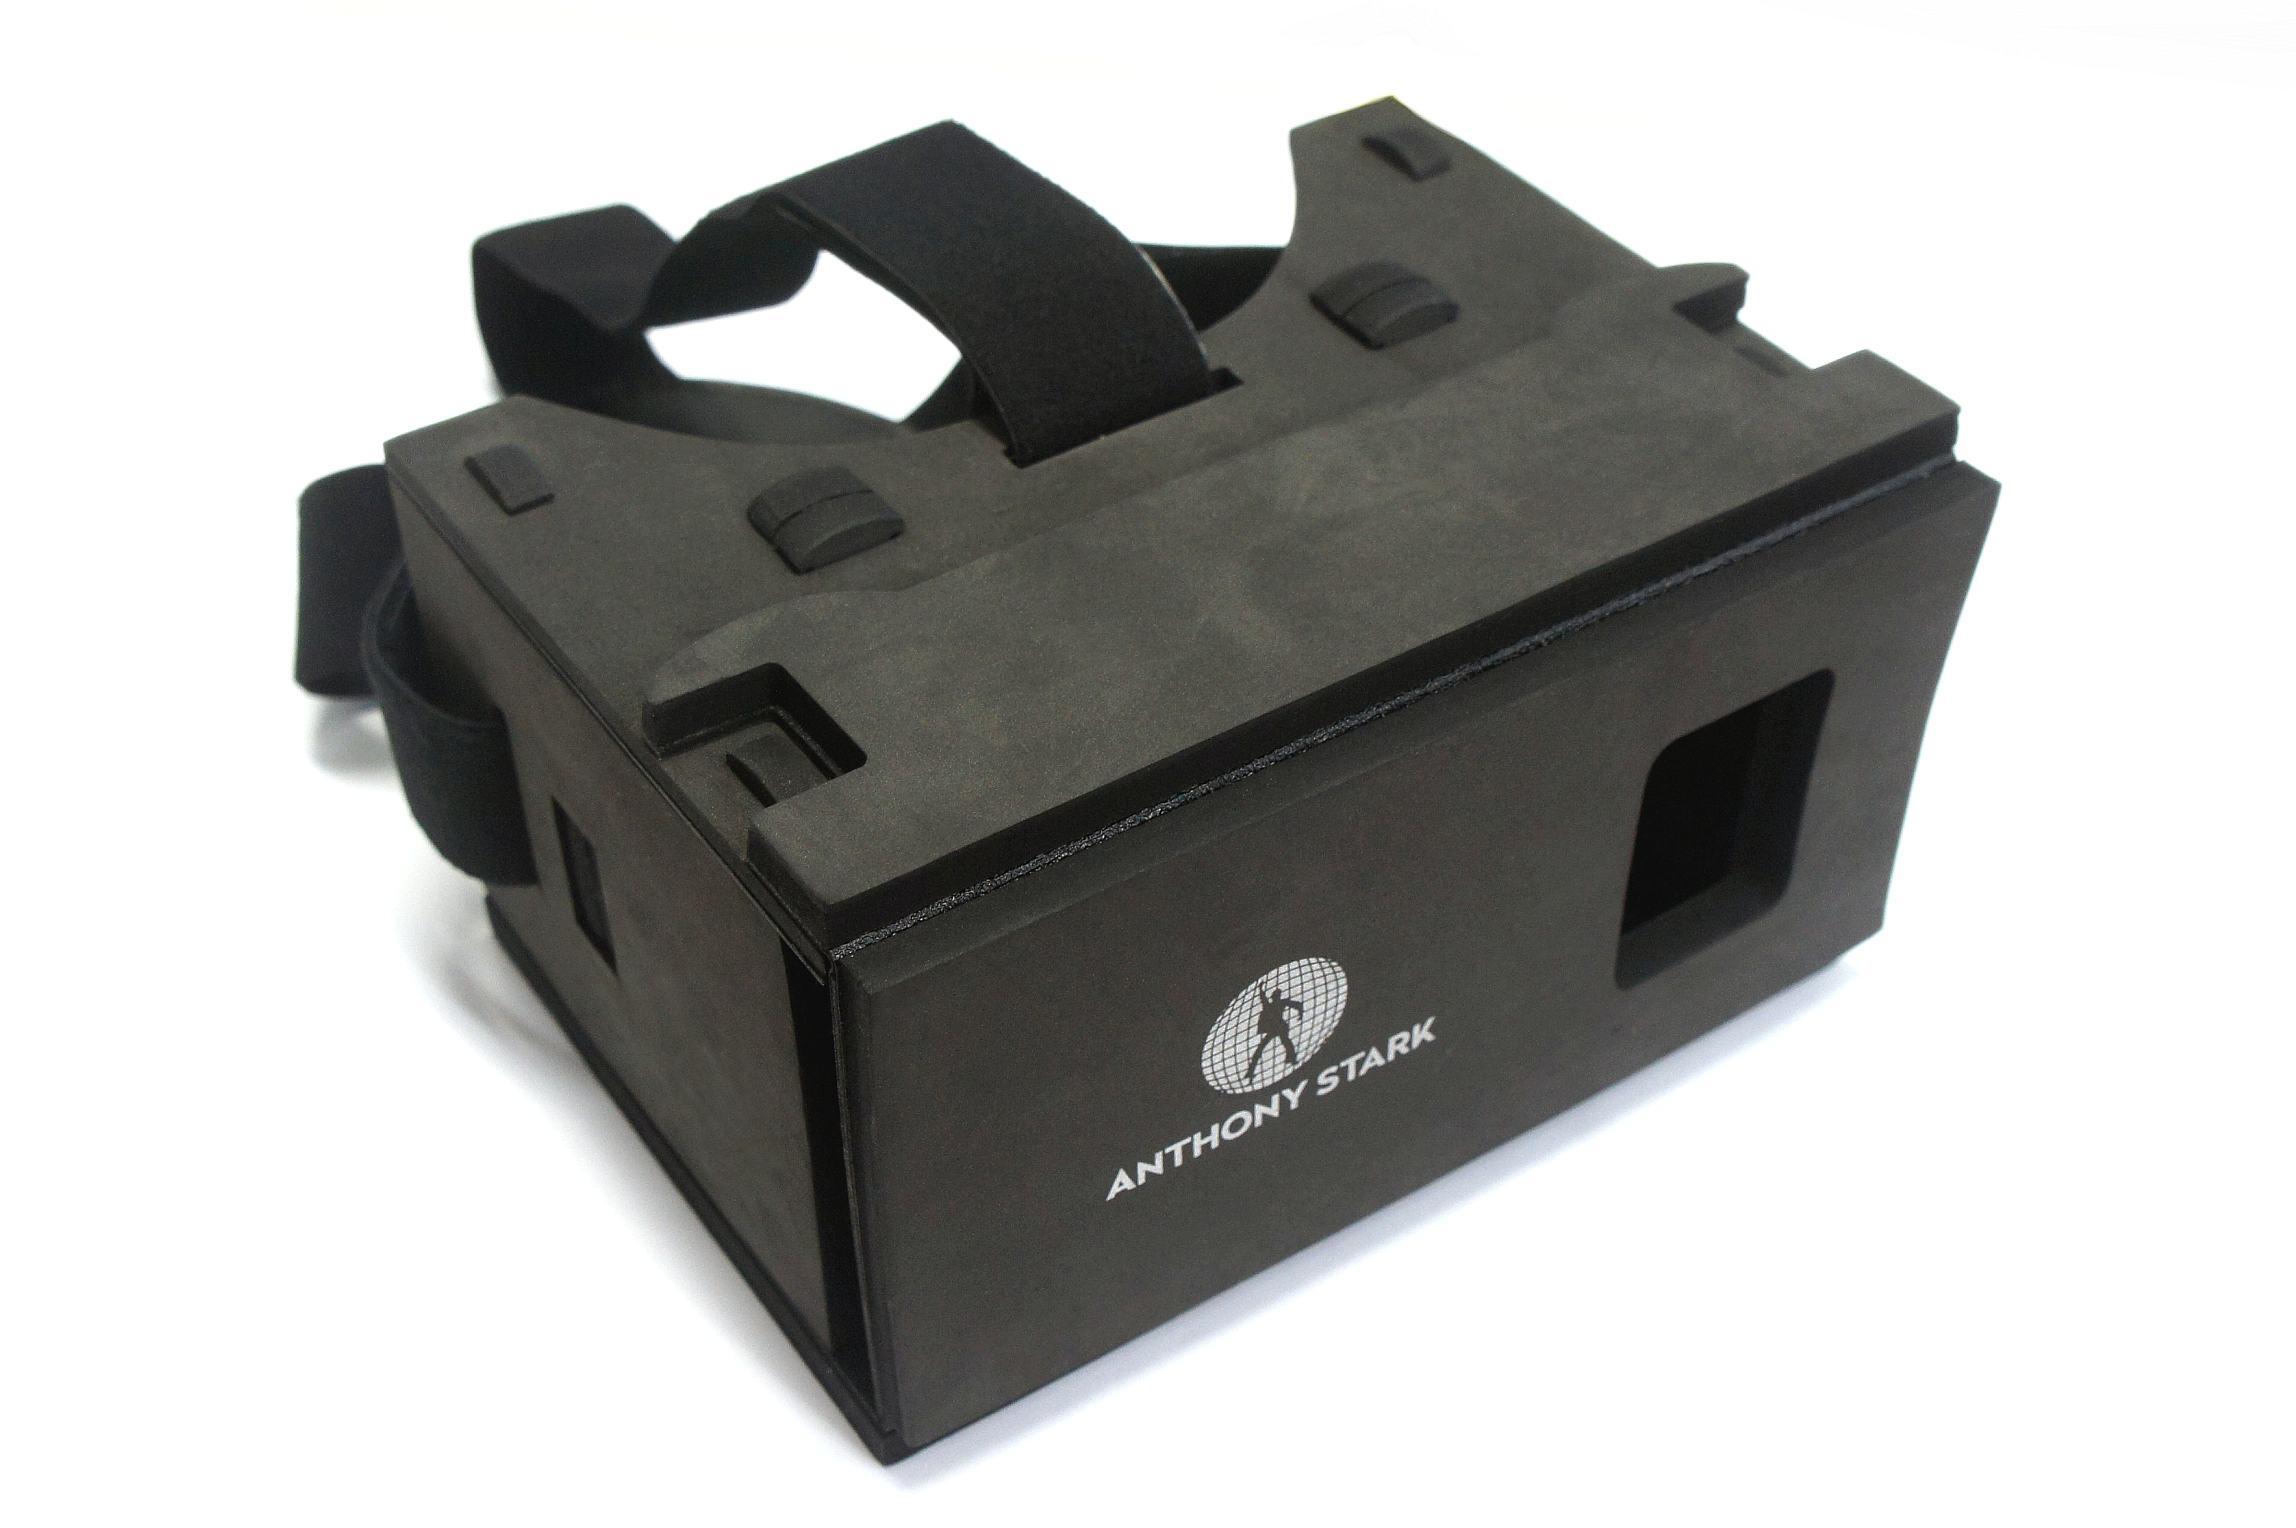 3d virtual reality brille spiele video iphone android vr googles cardboard neu ebay. Black Bedroom Furniture Sets. Home Design Ideas